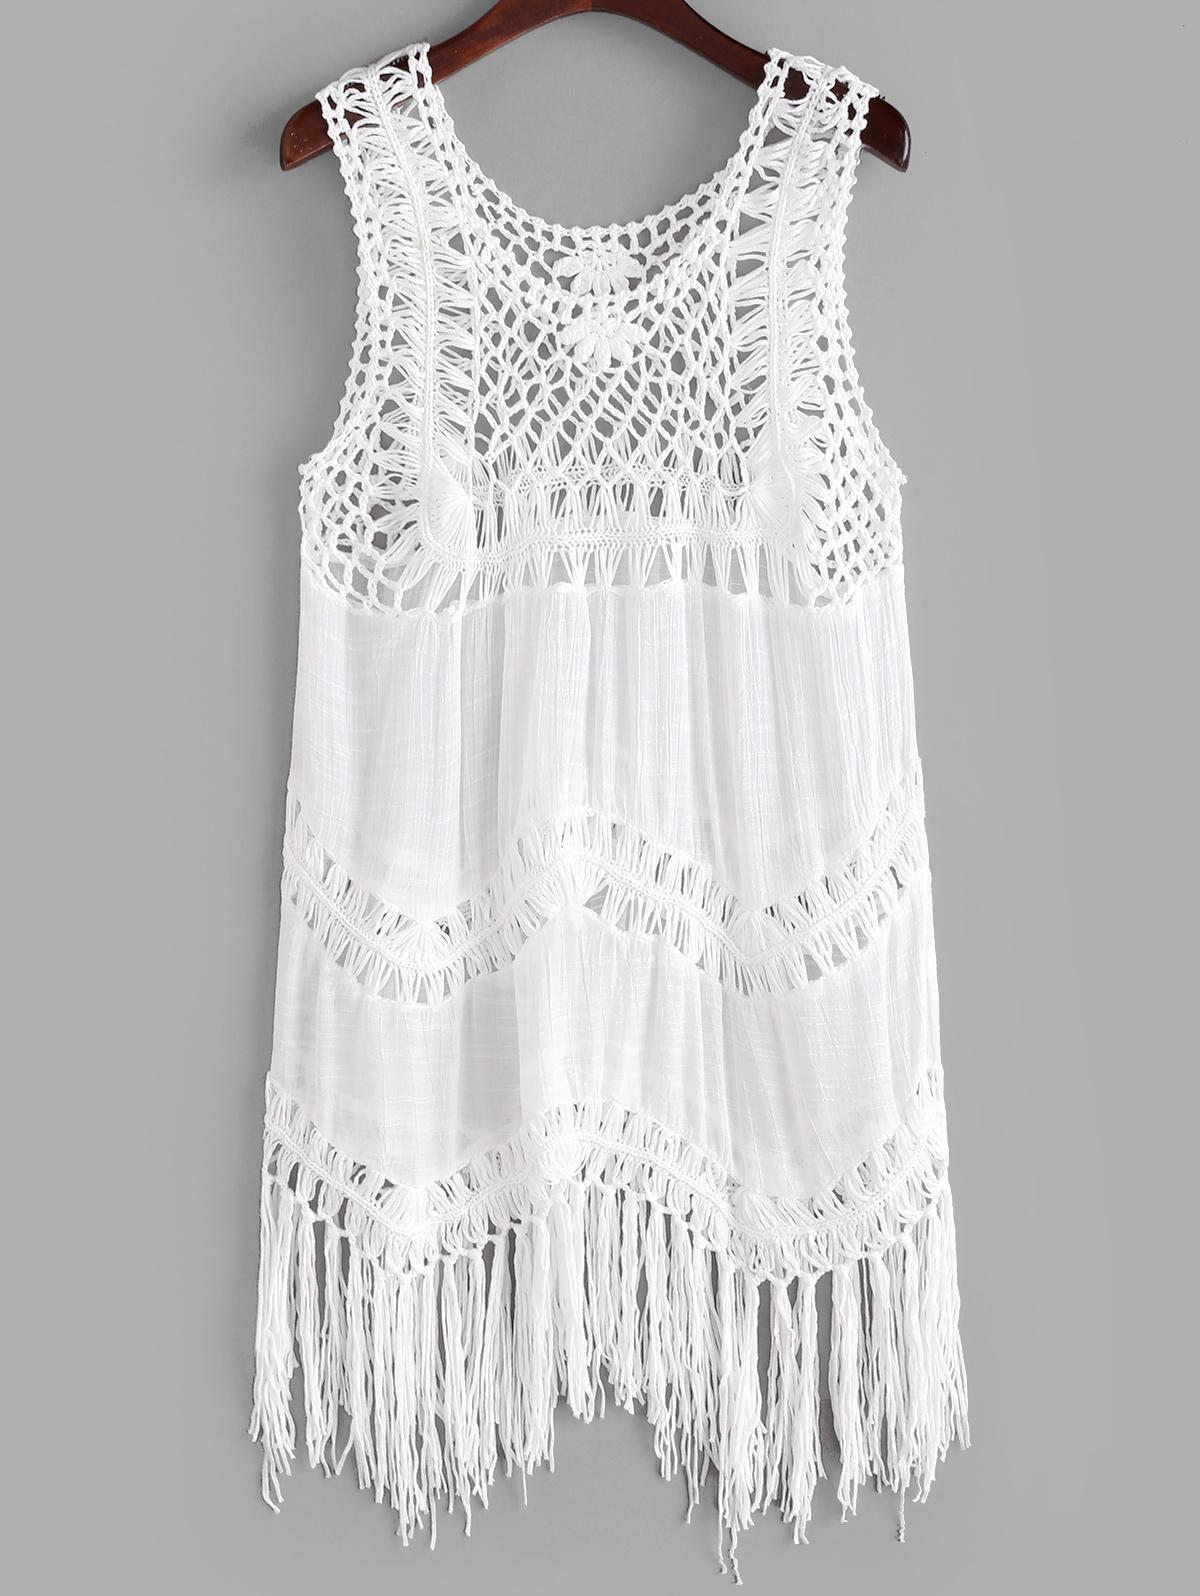 Solid Crochet Panel Tasseled Trim Cover Up Dress